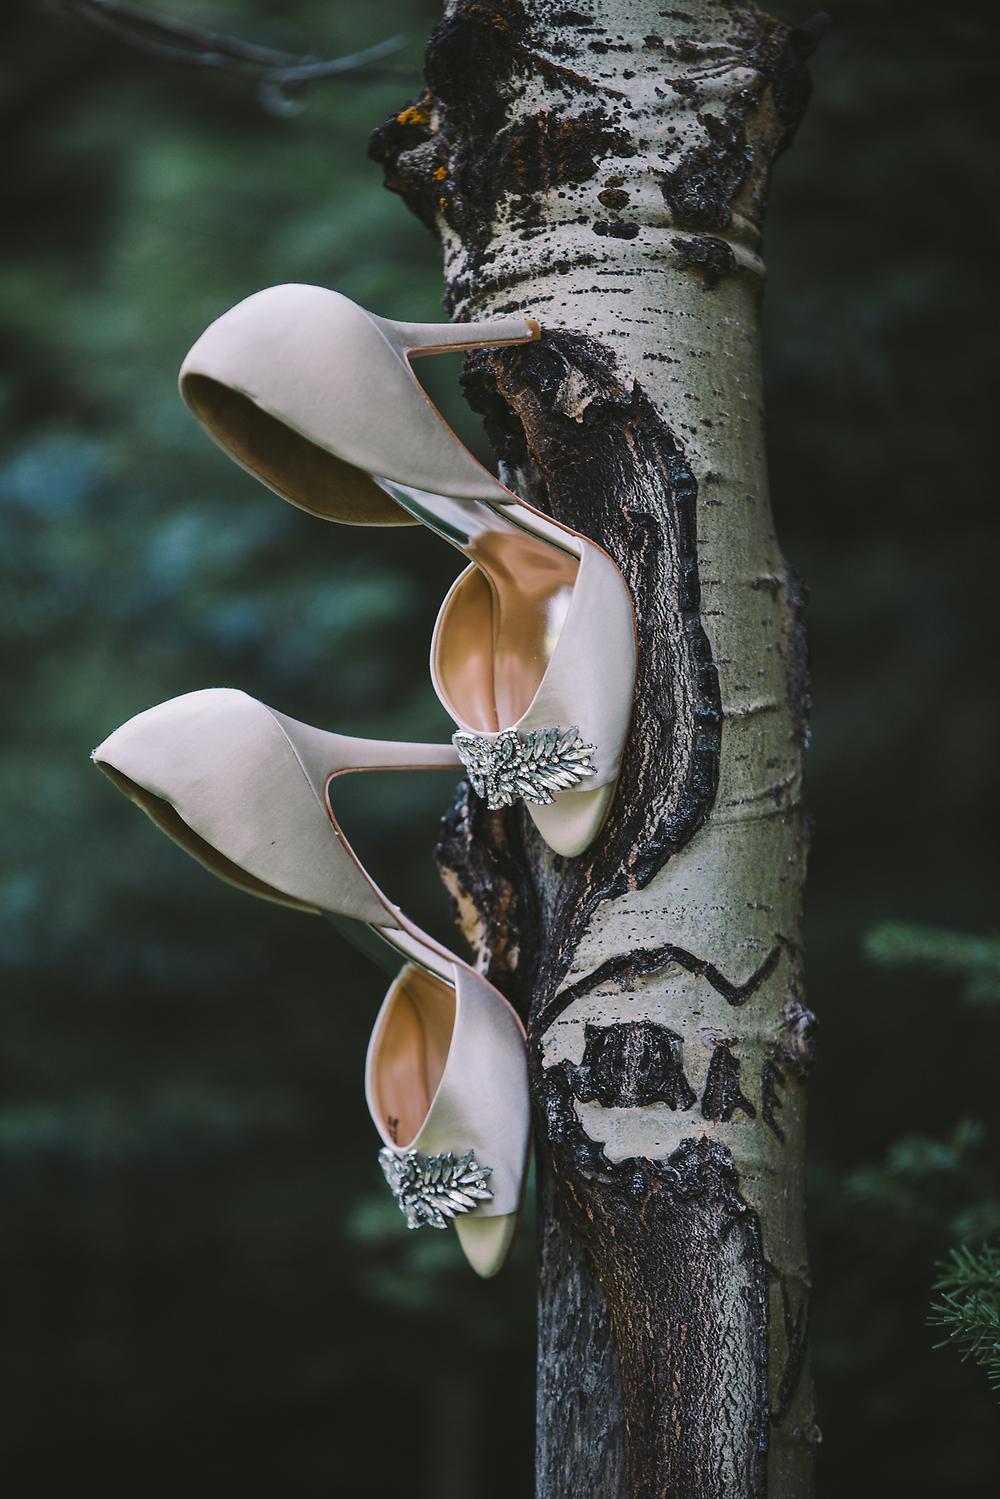 brett-birdsong-photography-082814-wedding-shoes.jpg